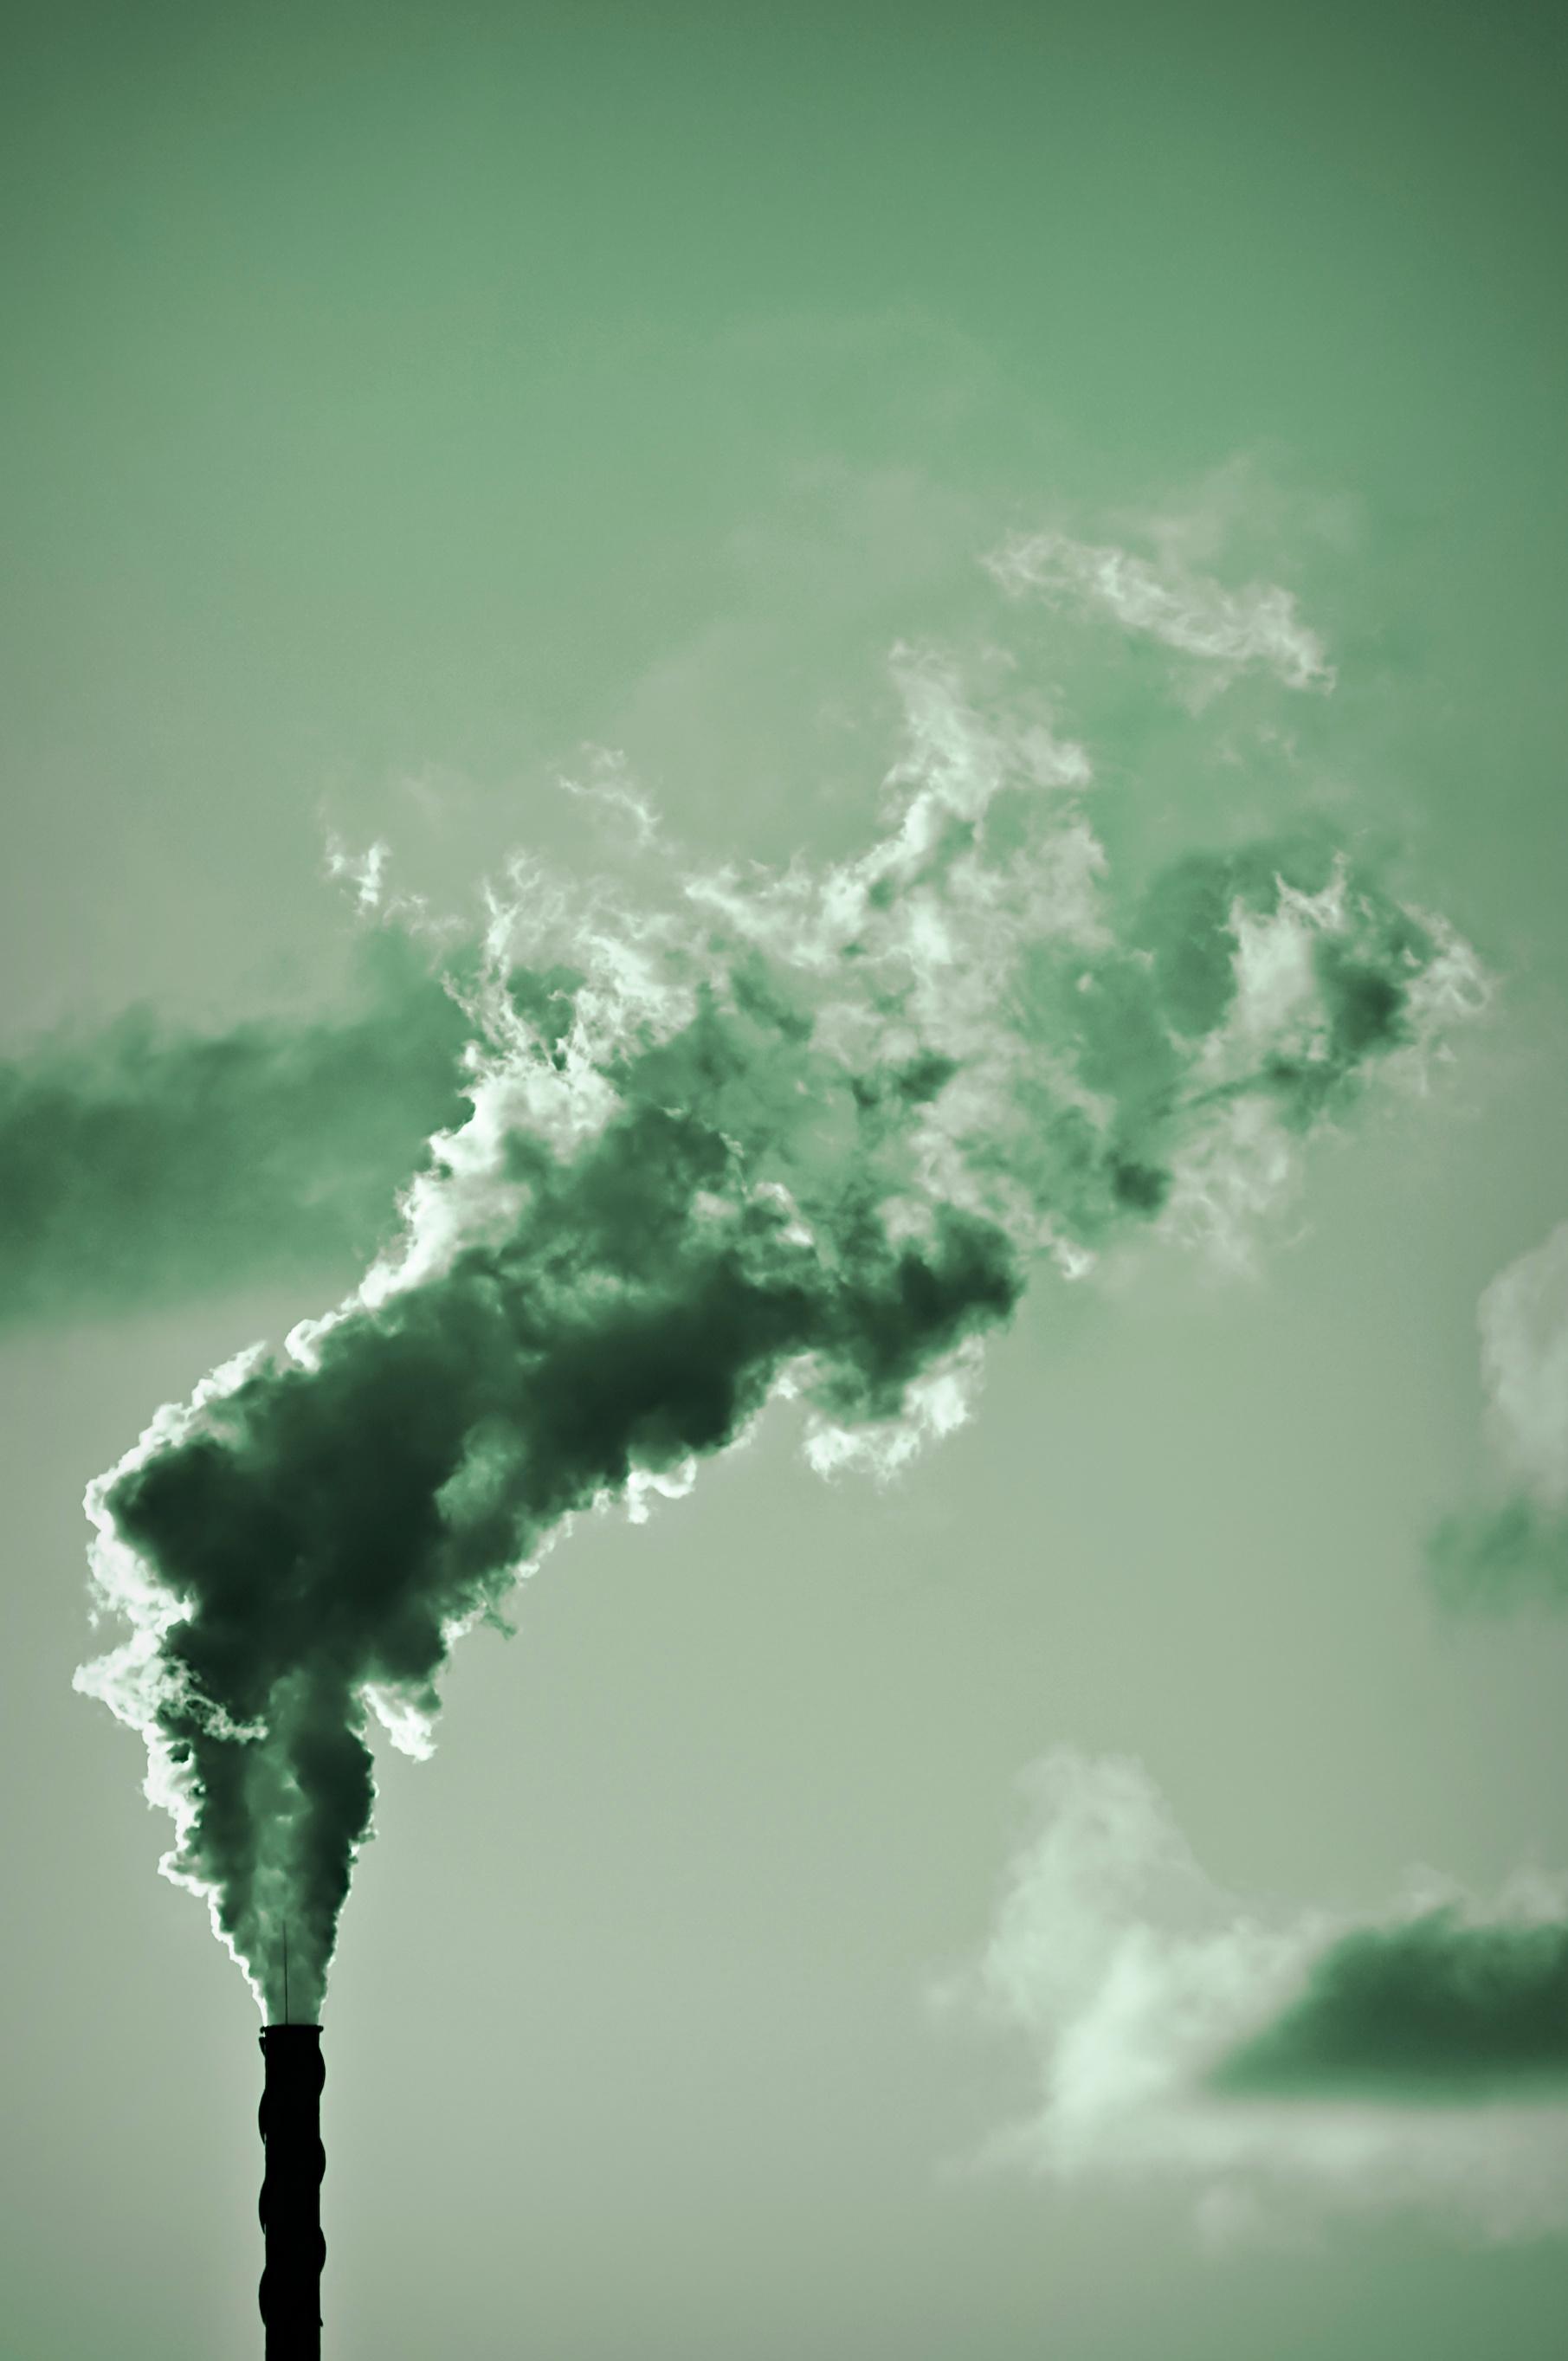 Confluence_of_Emissions_Standards.jpg